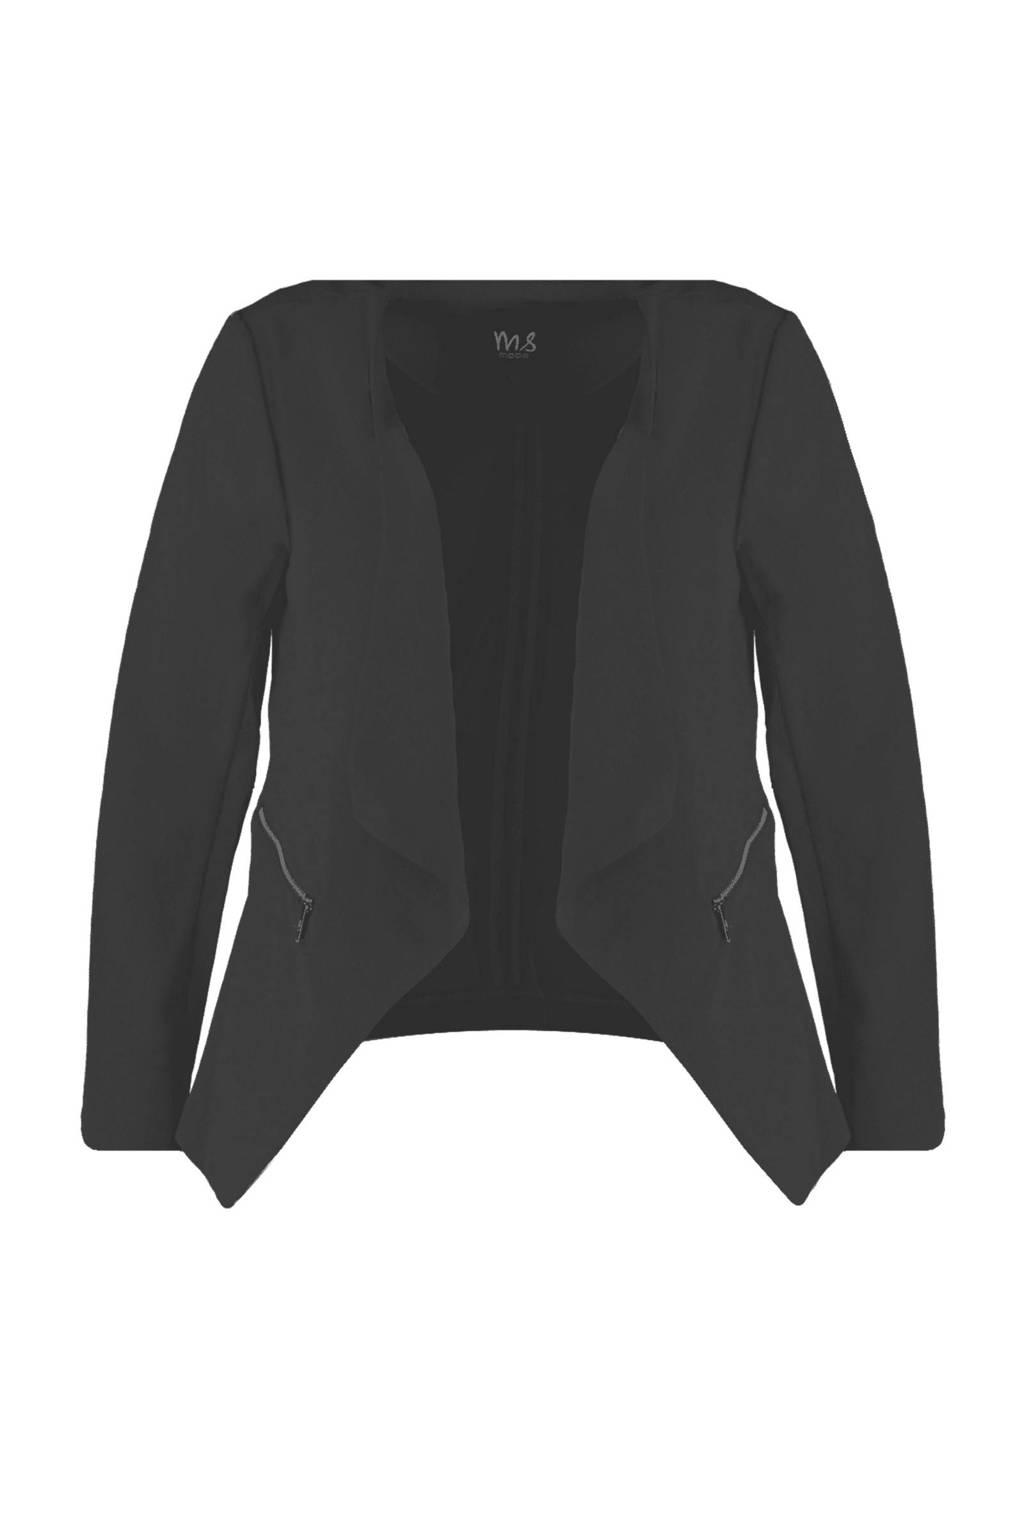 MS Mode blazer zwart, Zwart